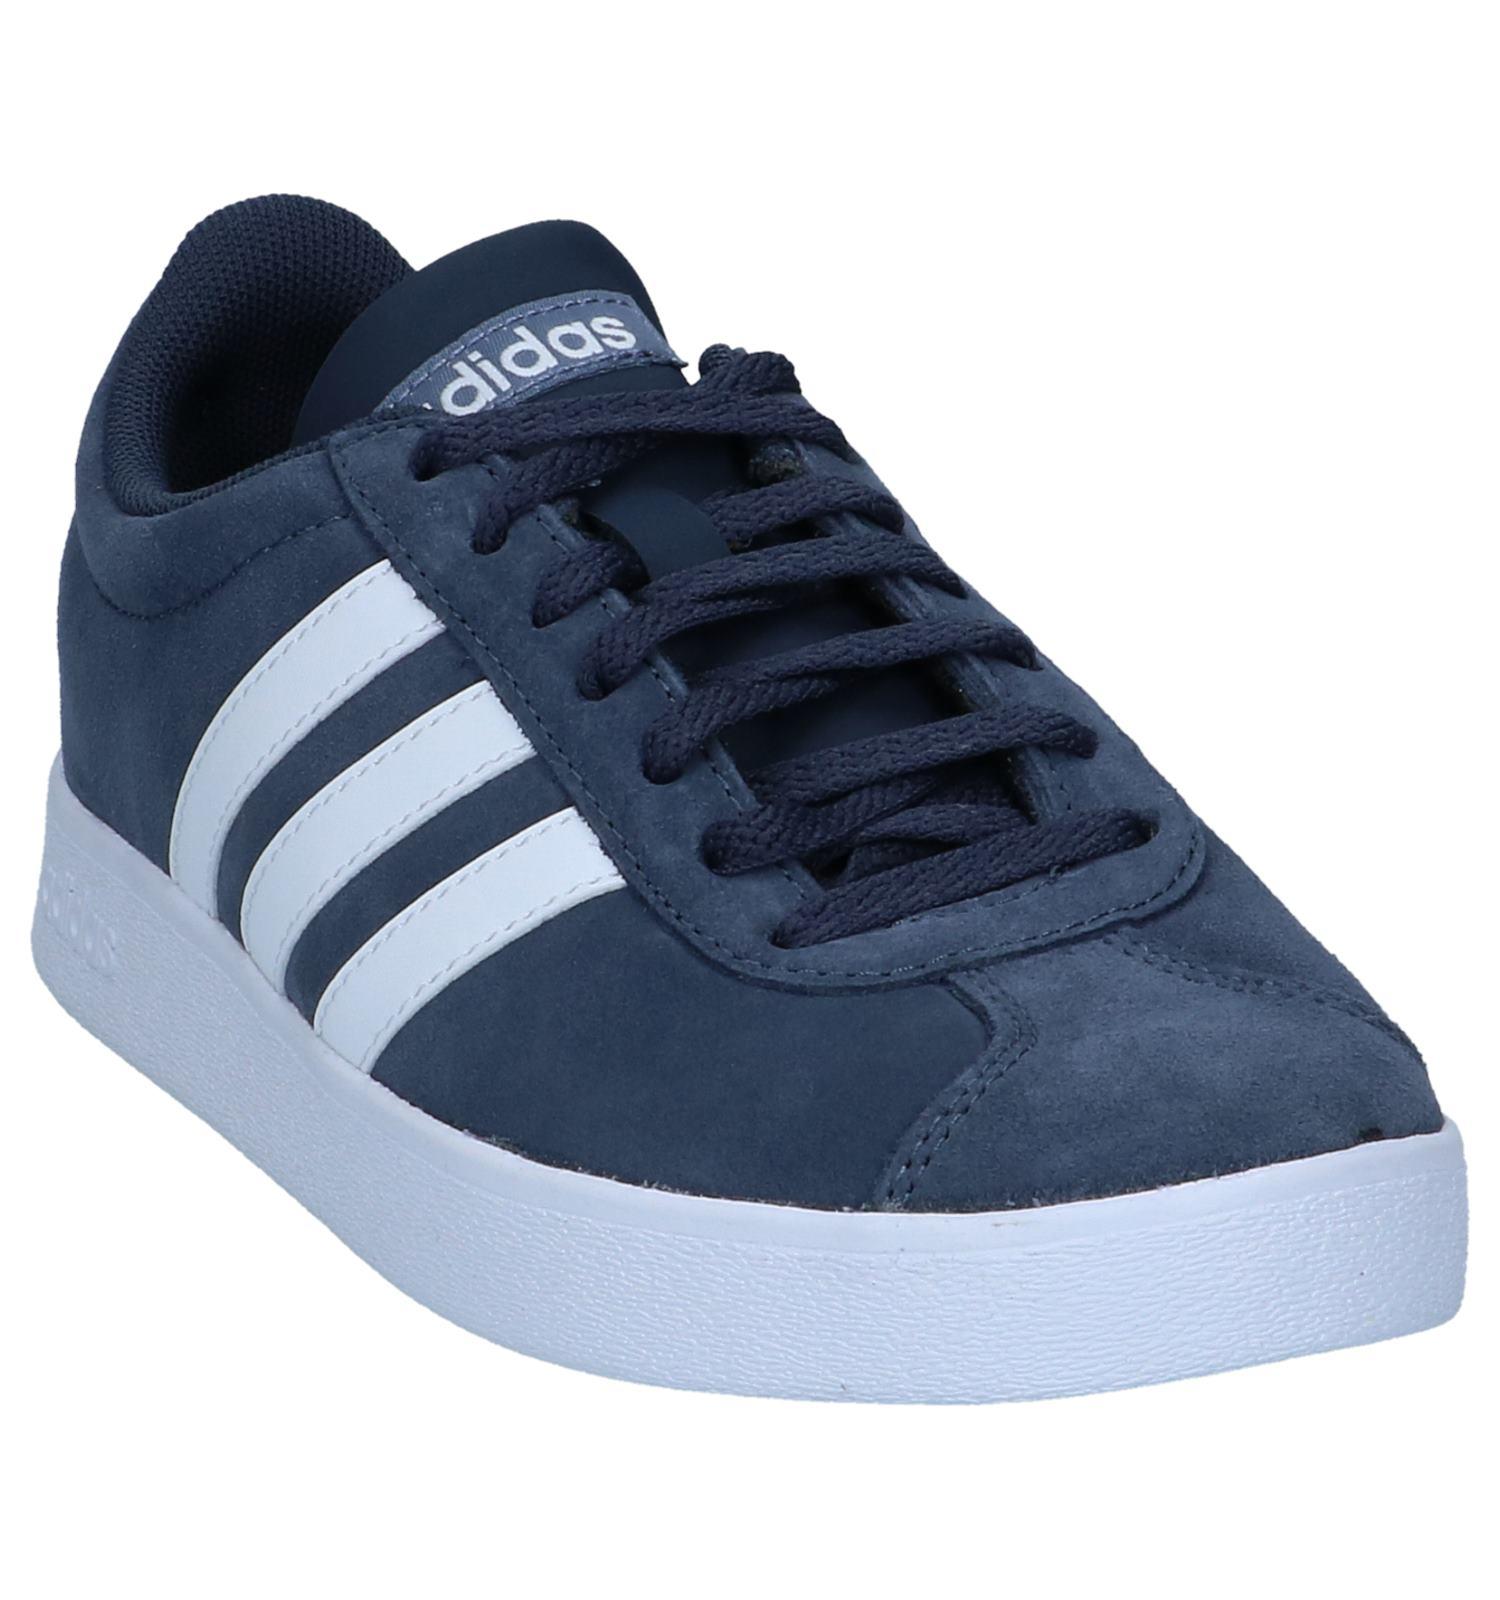 Donkerblauwe 2 Adidas 0 Sneakers Court Vol OPTZukXi